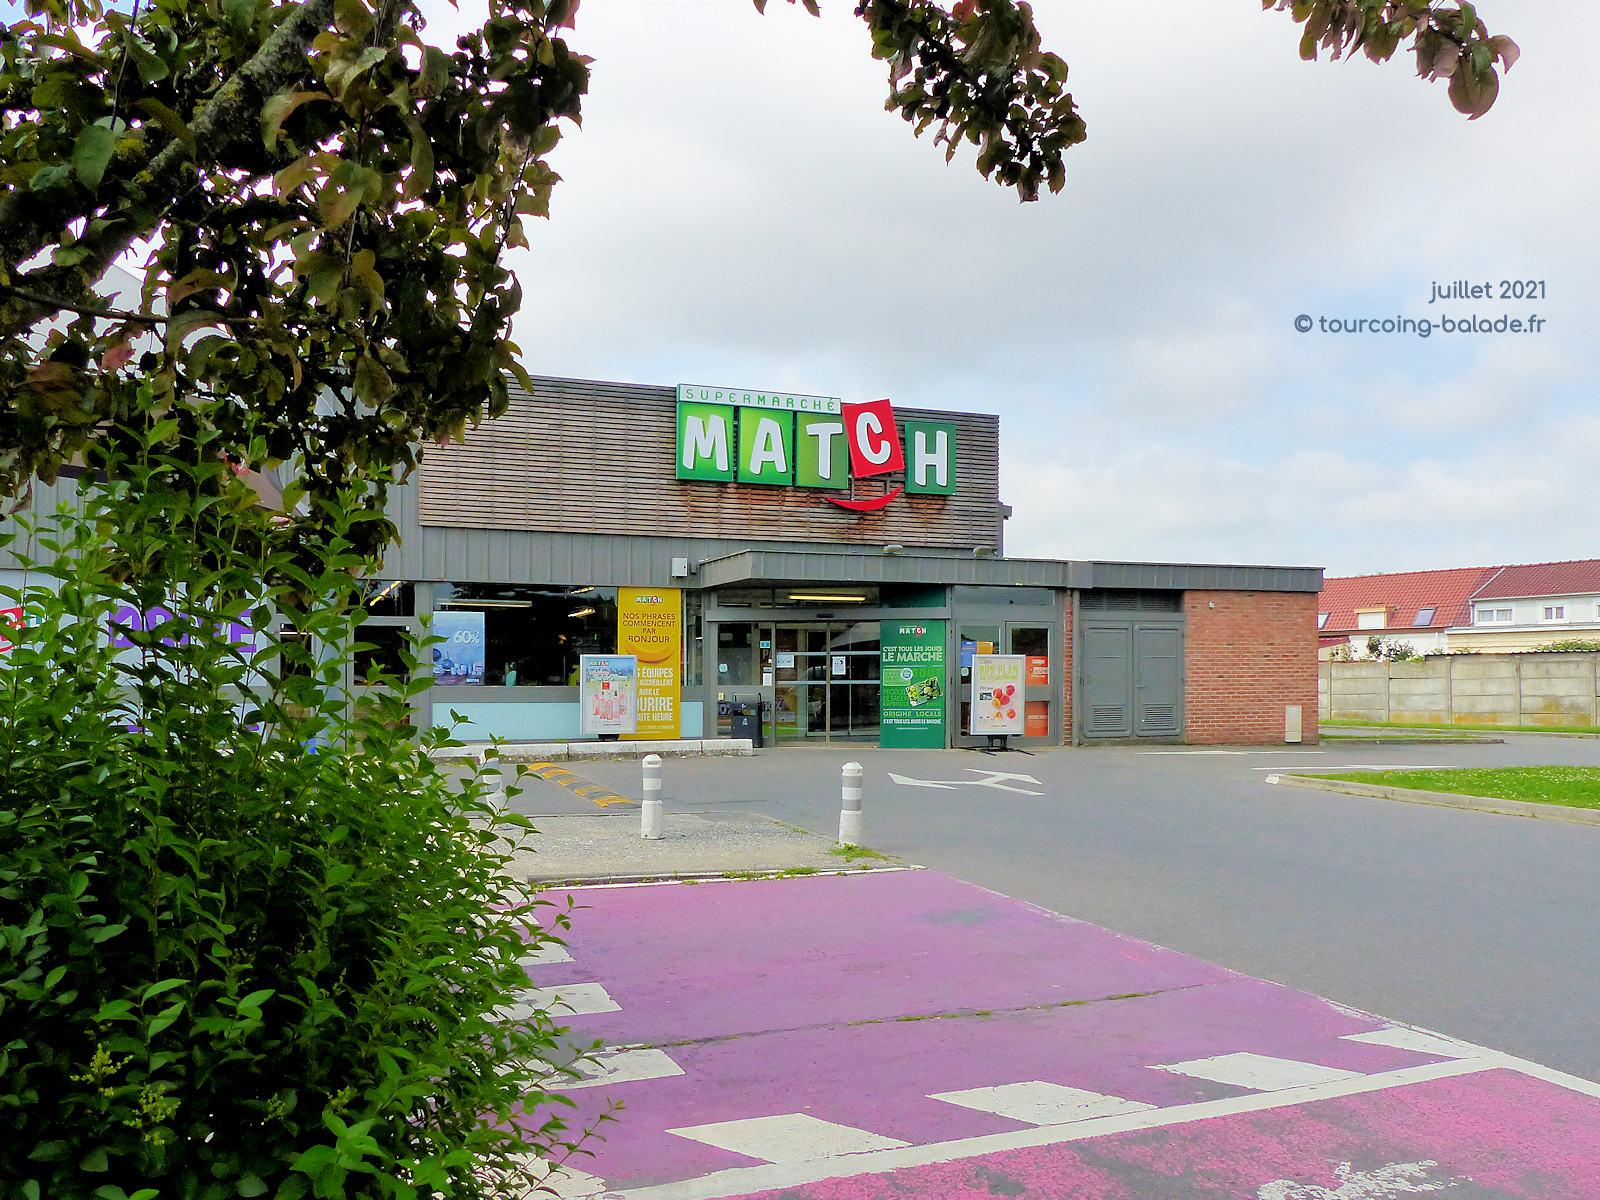 Supermarché Match Fleurus, Tourcoing